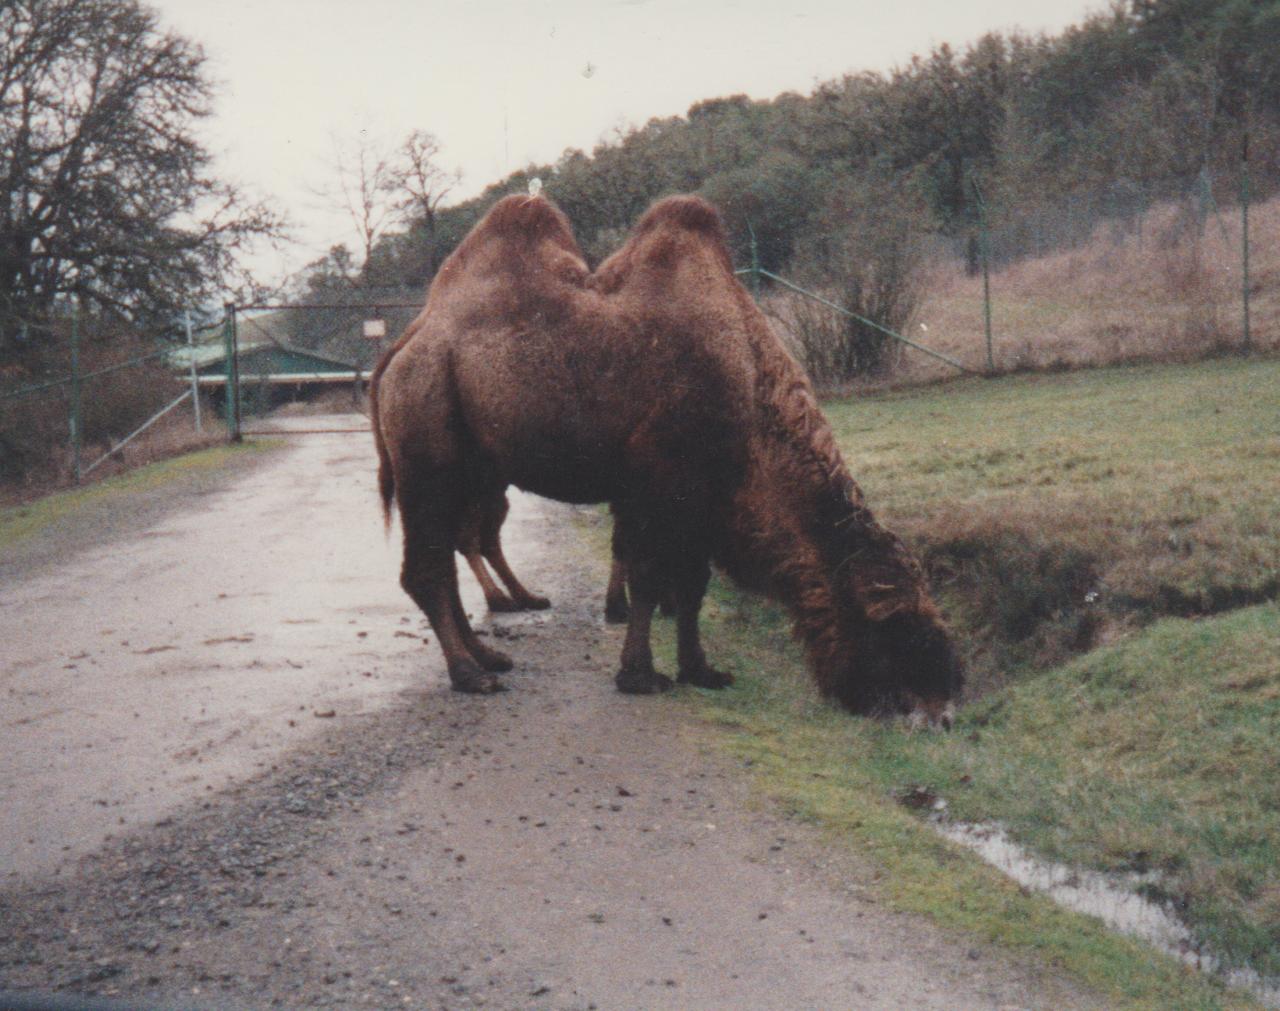 1992-12-26 - Saturday - Wildlife Safari Trip, Marilyn, Crystal-17.png